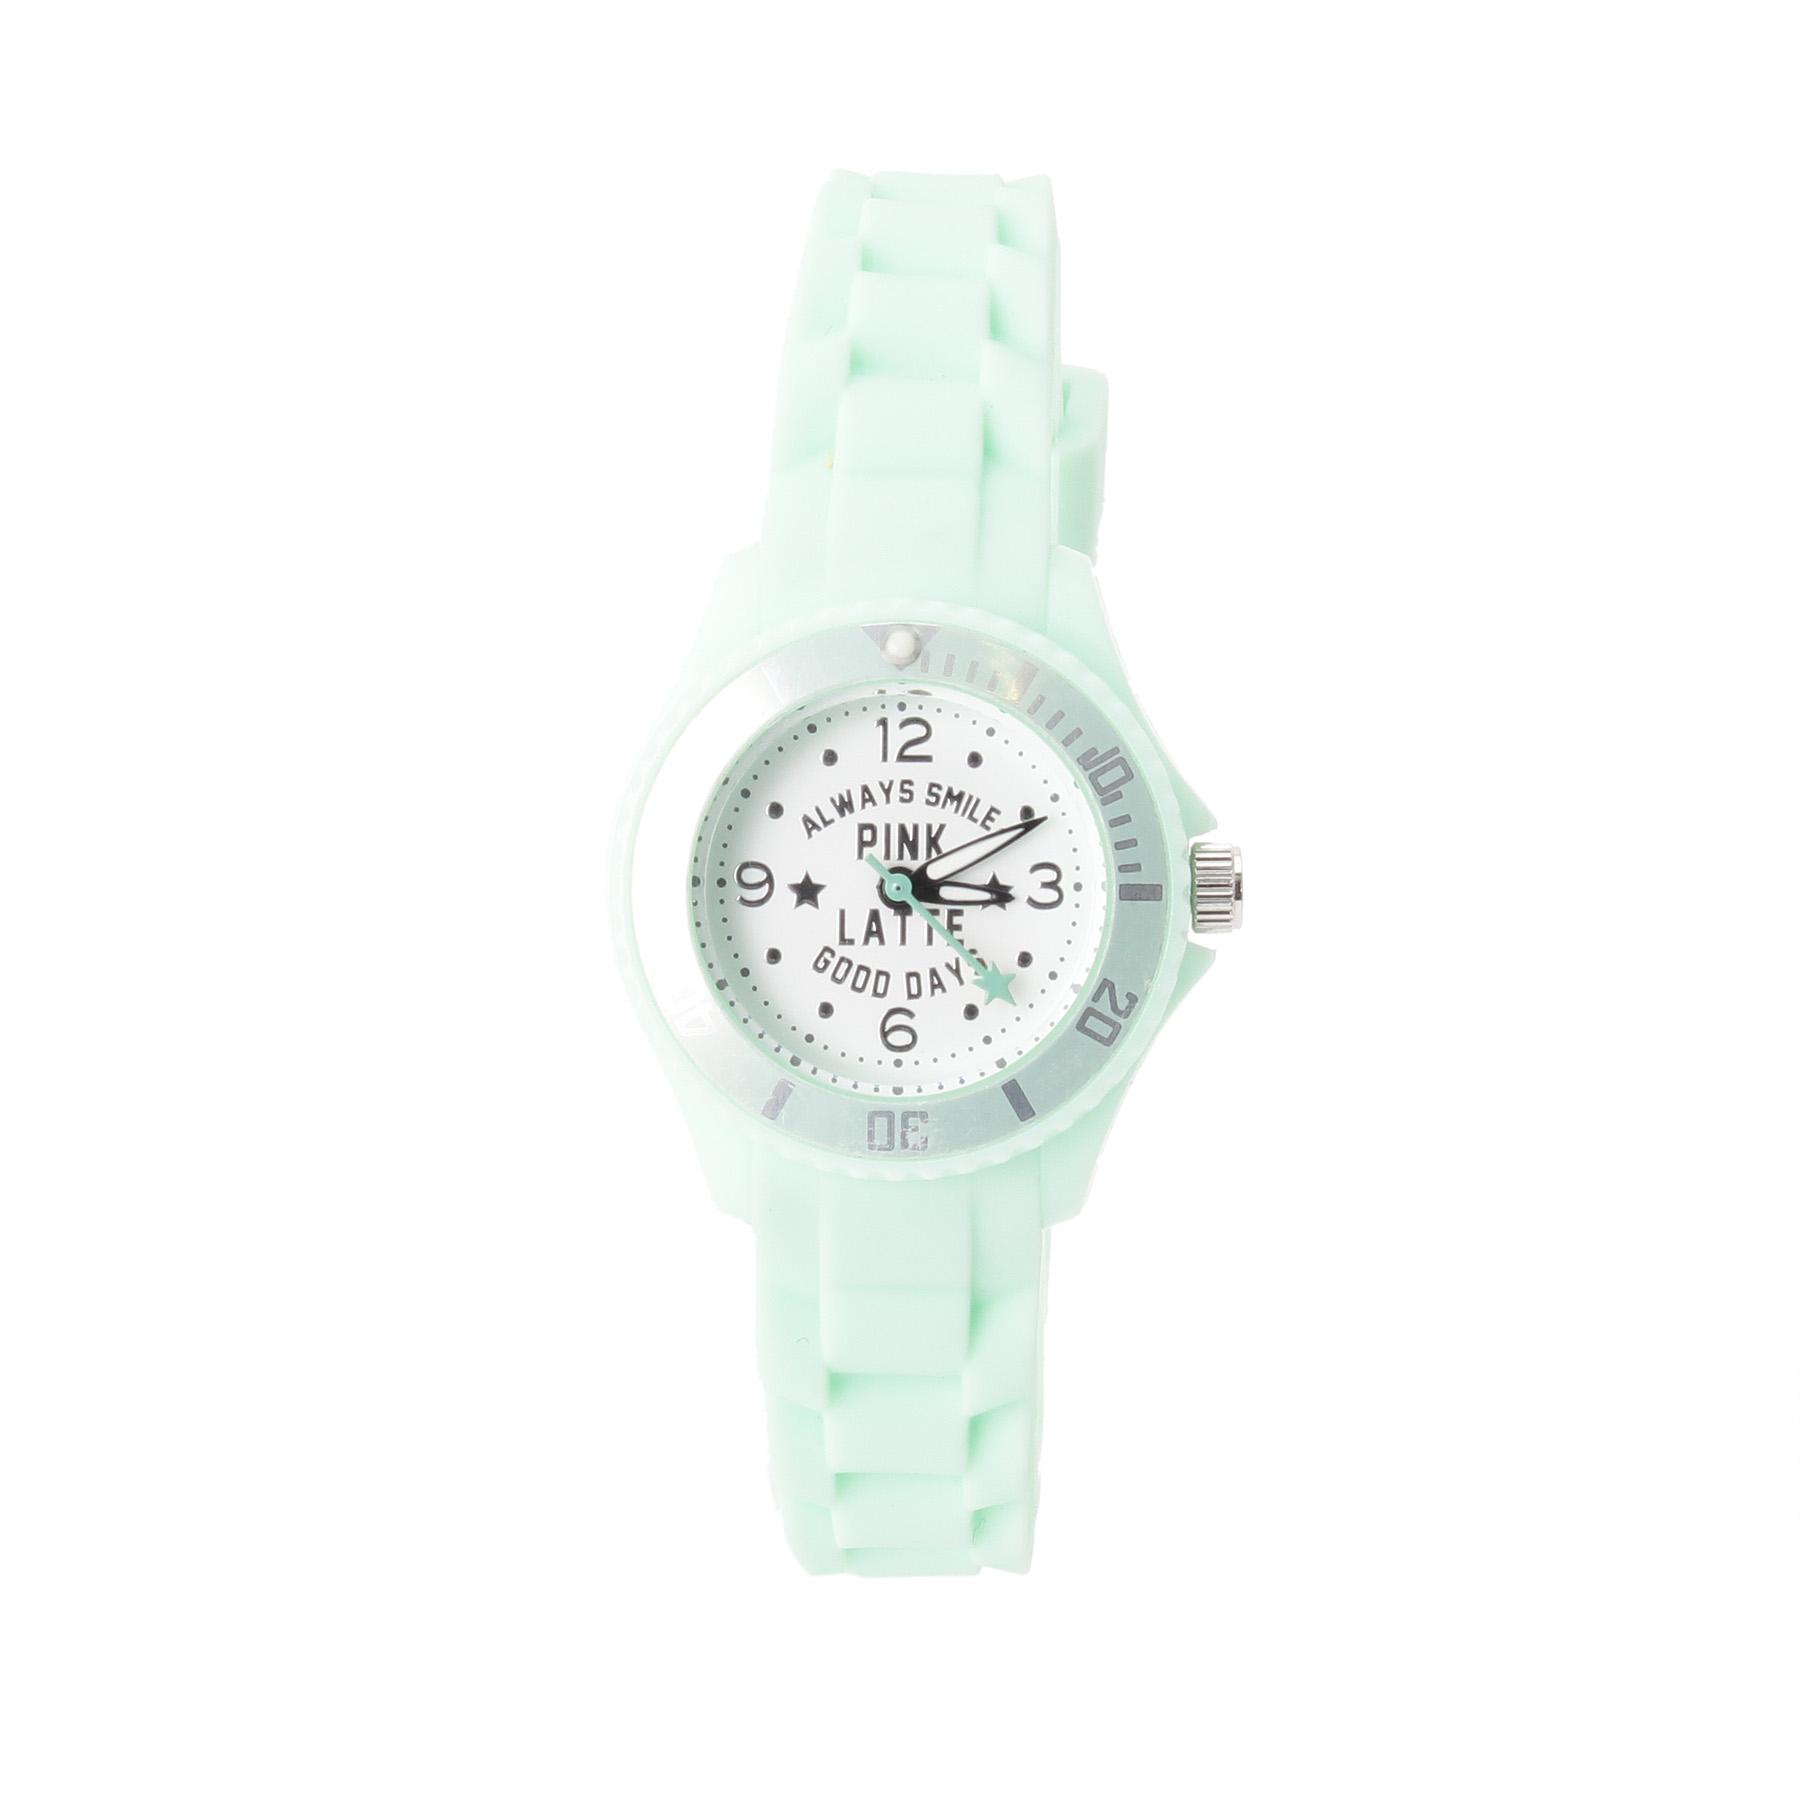 【PINK-latte (ピンク ラテ)】ラバーウォッチ(スター)ティーンズ 雑貨|腕時計 ライトグリーン